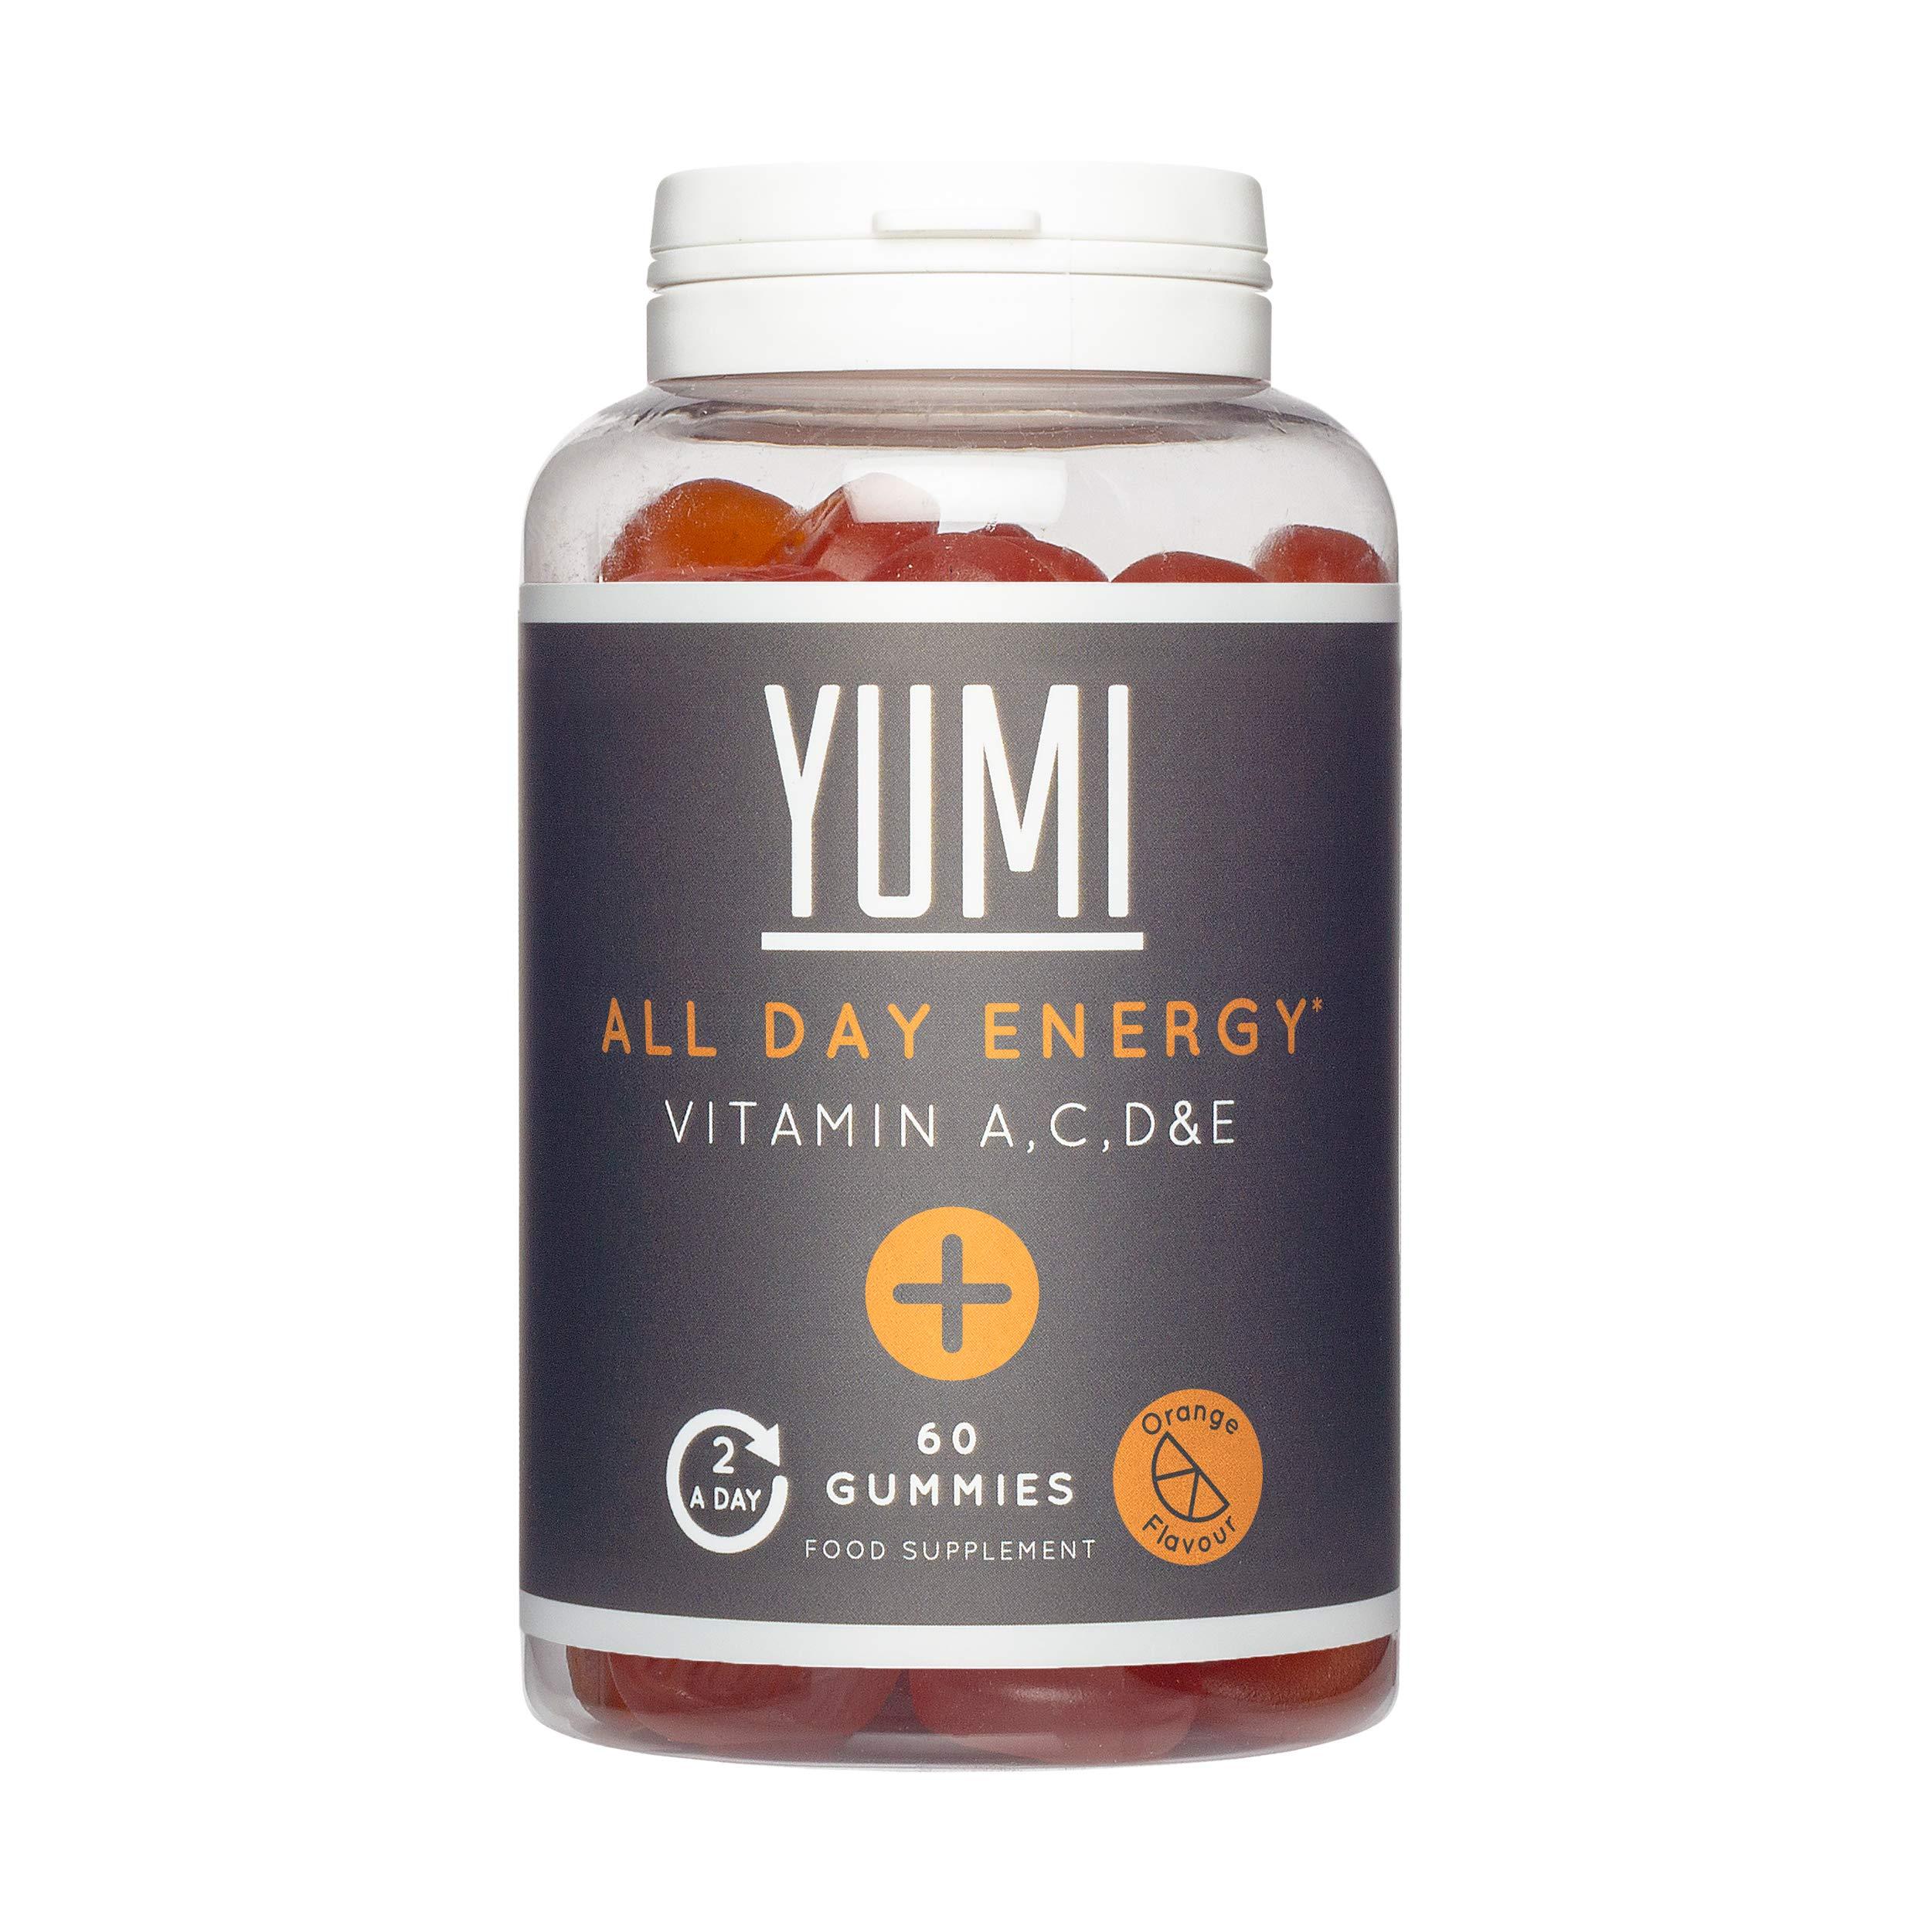 Yumi All Day Energy Multivitamin + Biotin Gummies | Essential Vitamins A,D,E,C,B6 Biotin & Minerals Supplement | 60 Vegan Friendly Gummies (Orange Flavour)